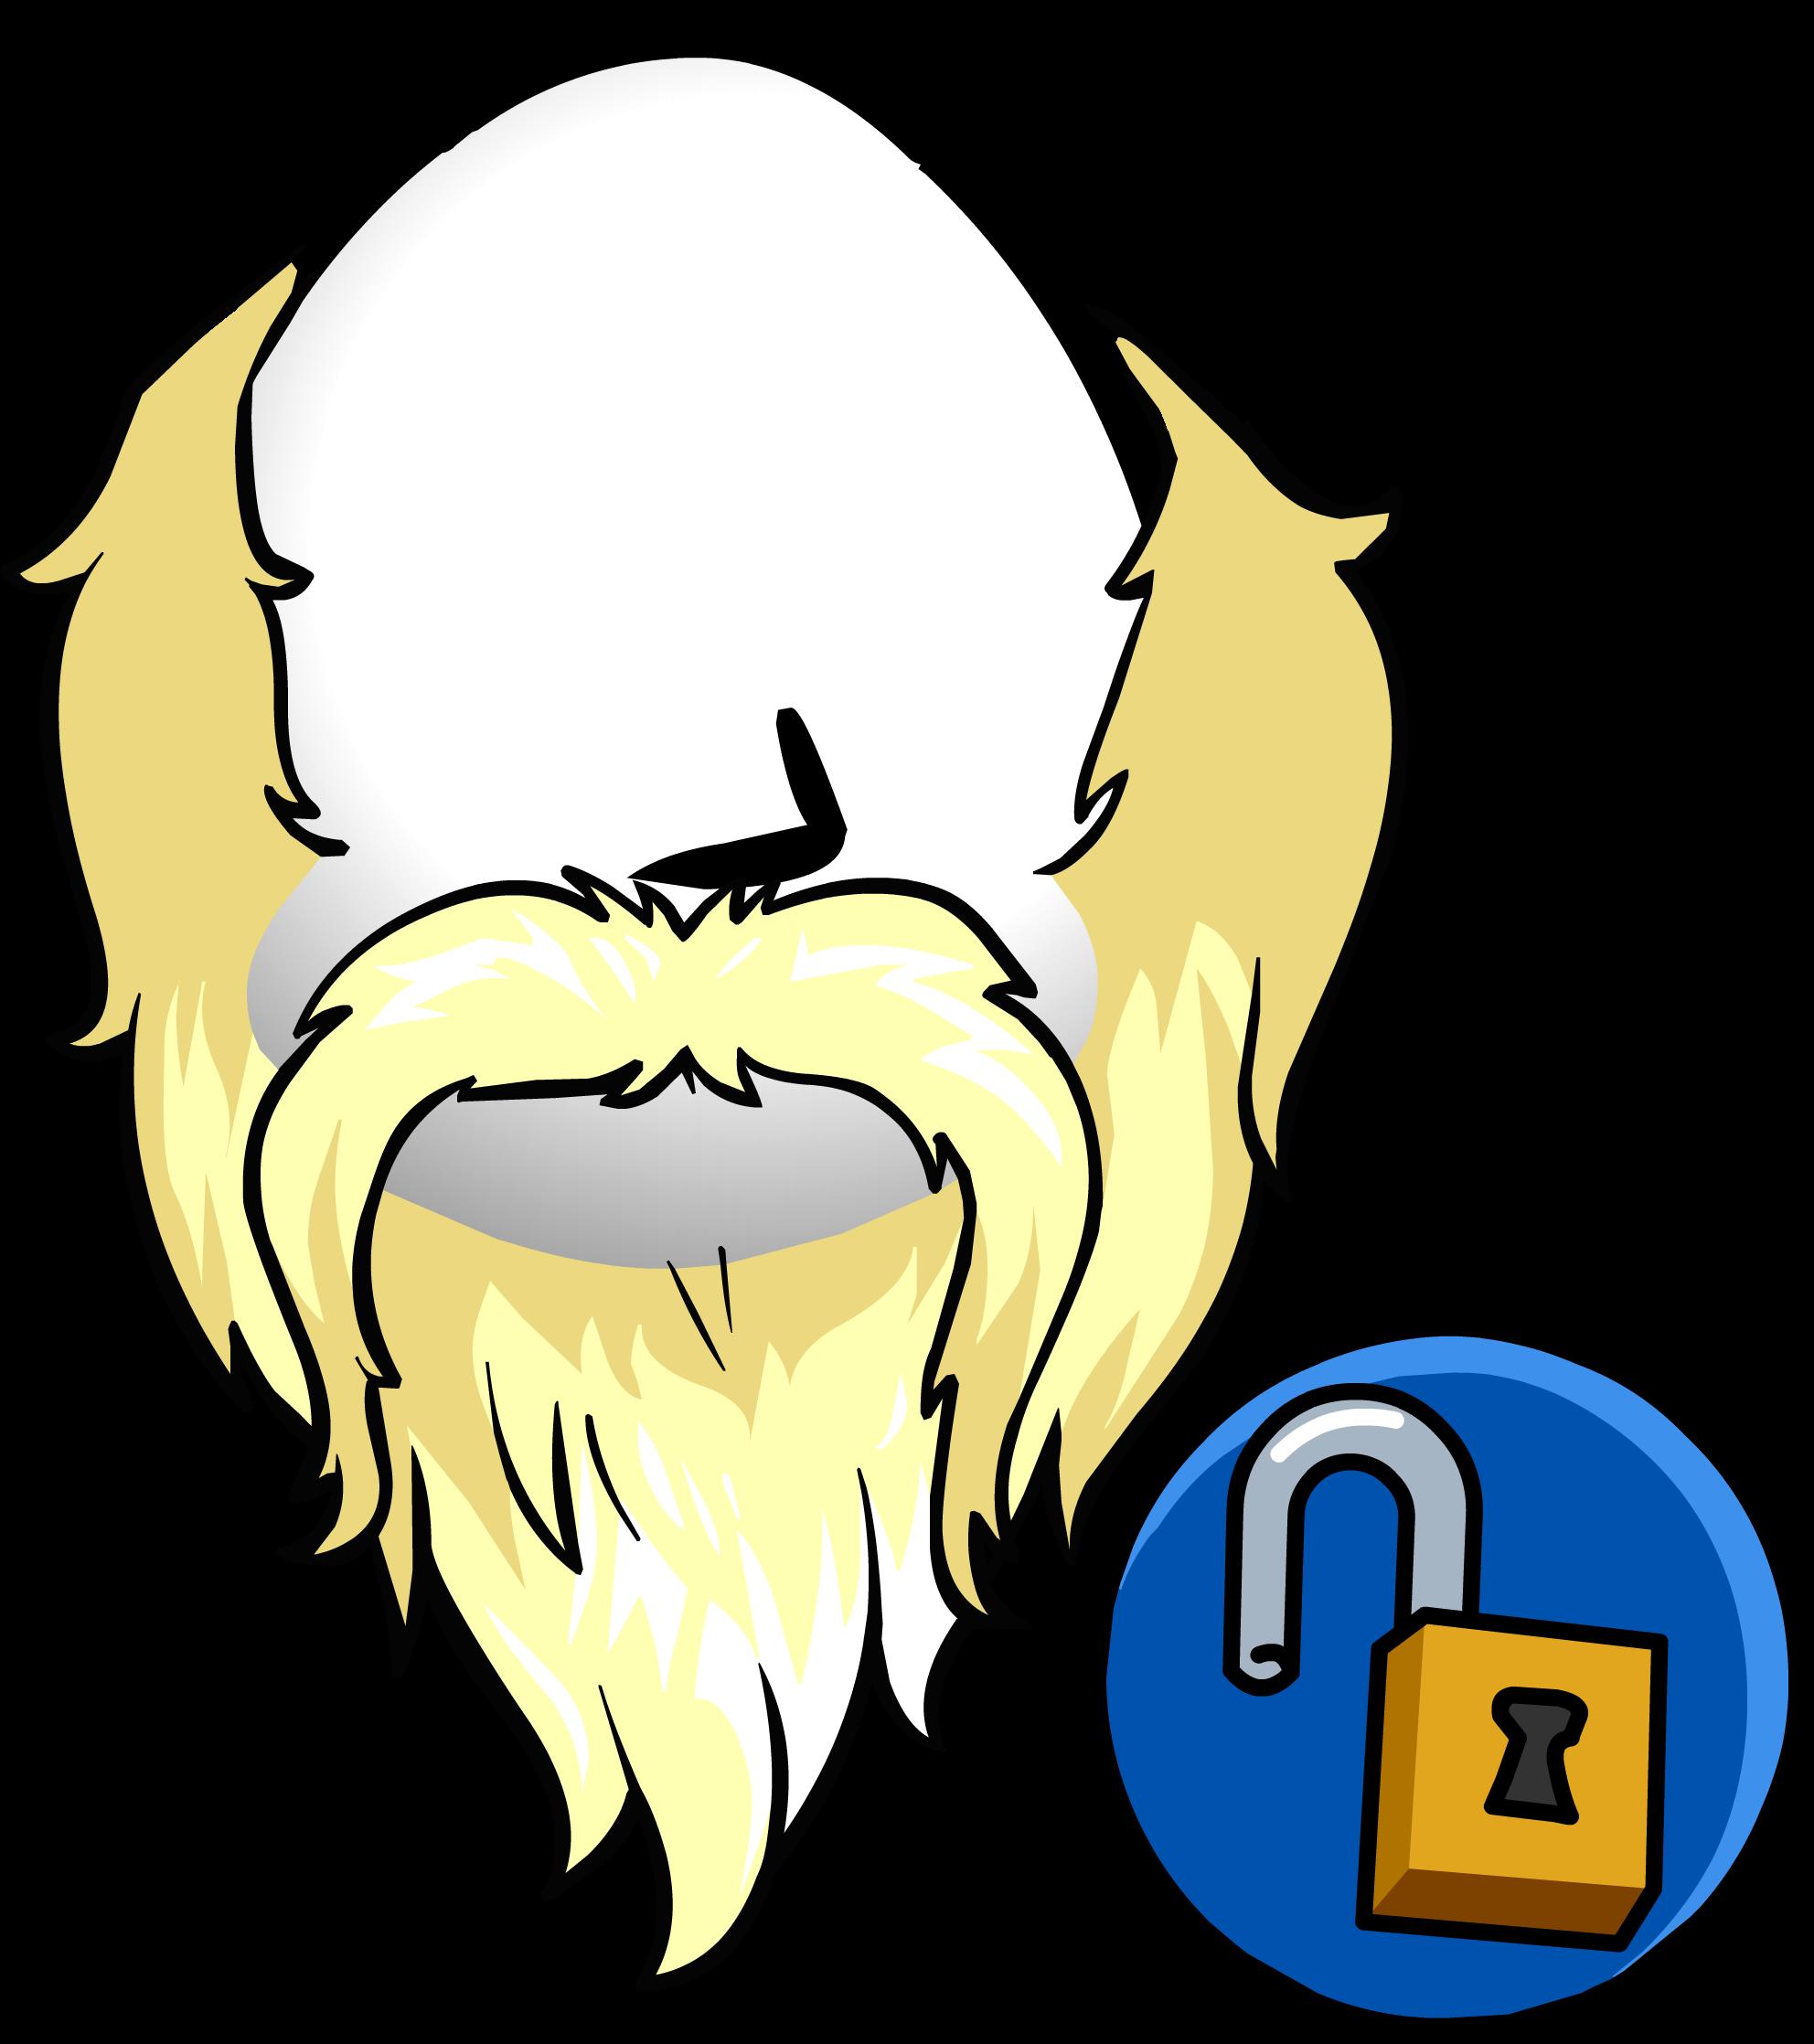 Beard clipart viking beard. Club penguin wiki fandom